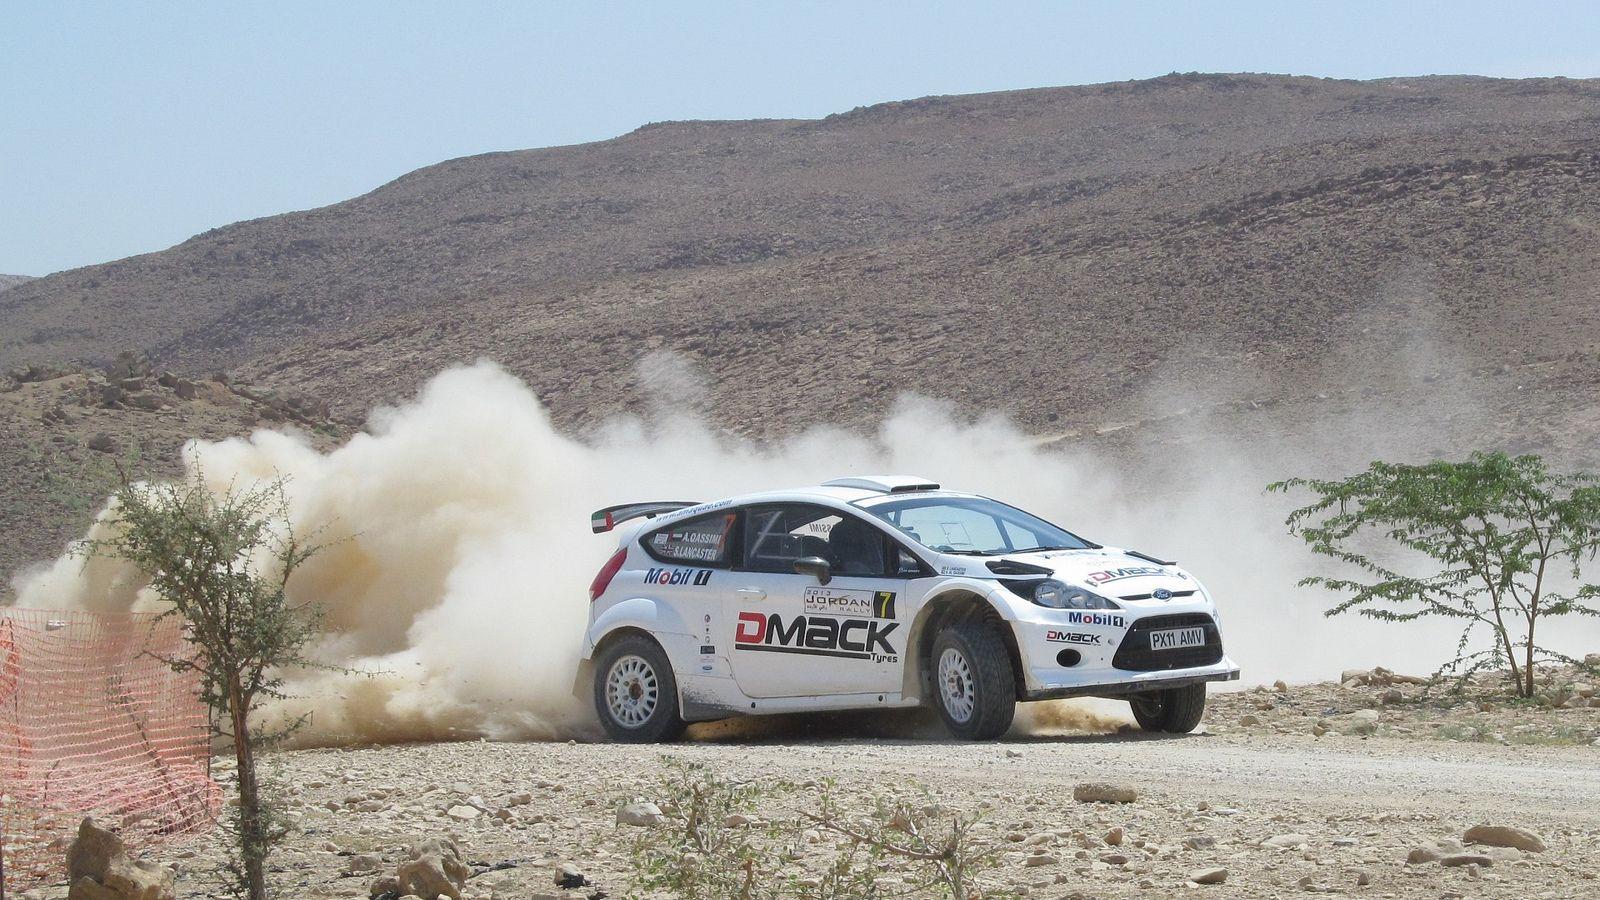 Shk. Abdullah AlQassimi Mount Nebo 1 Ford fiesta